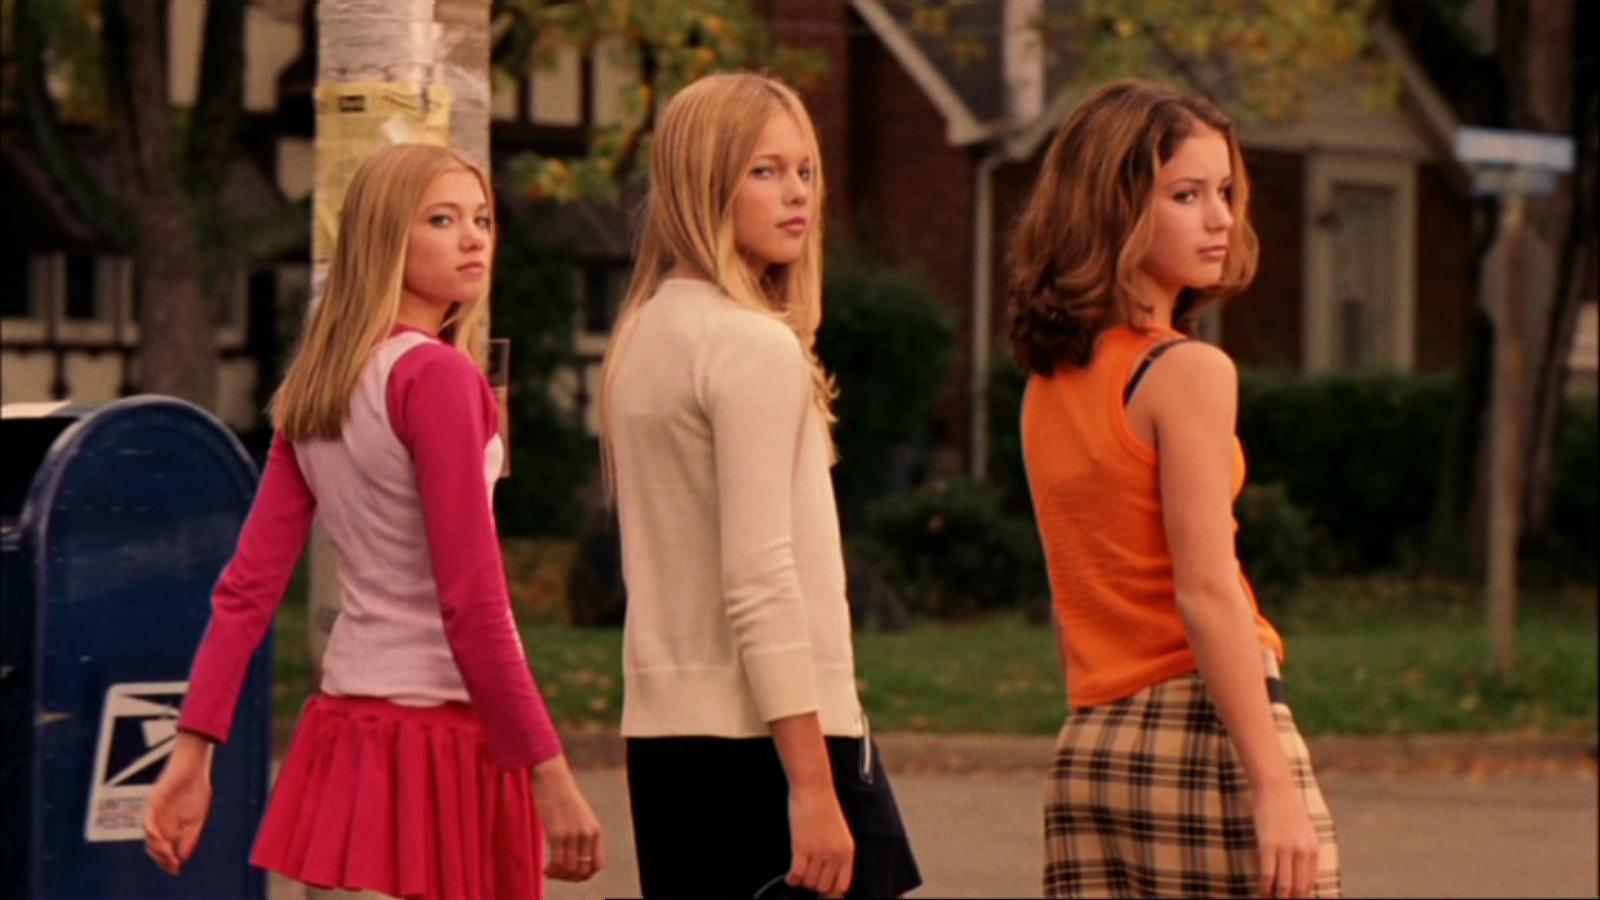 Mean-Girls-screencap-mean-girls-2363541-1600-900.jpg